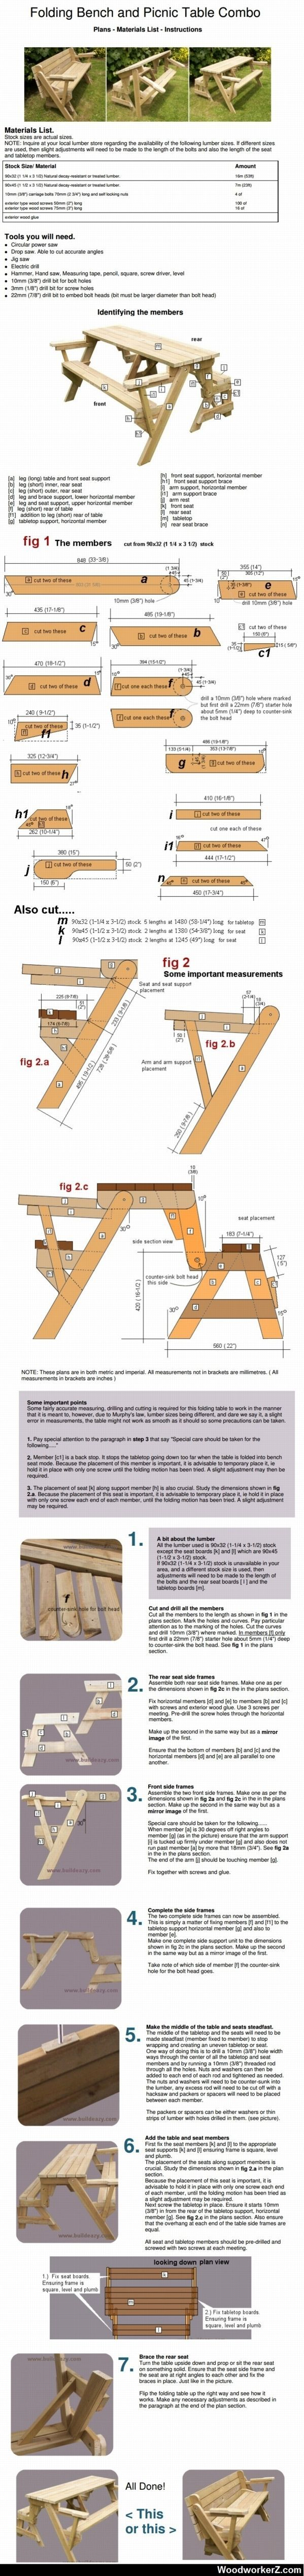 Folding Bancos Pinterest Table Bench And ComboBancas Picnic Yfy76gb